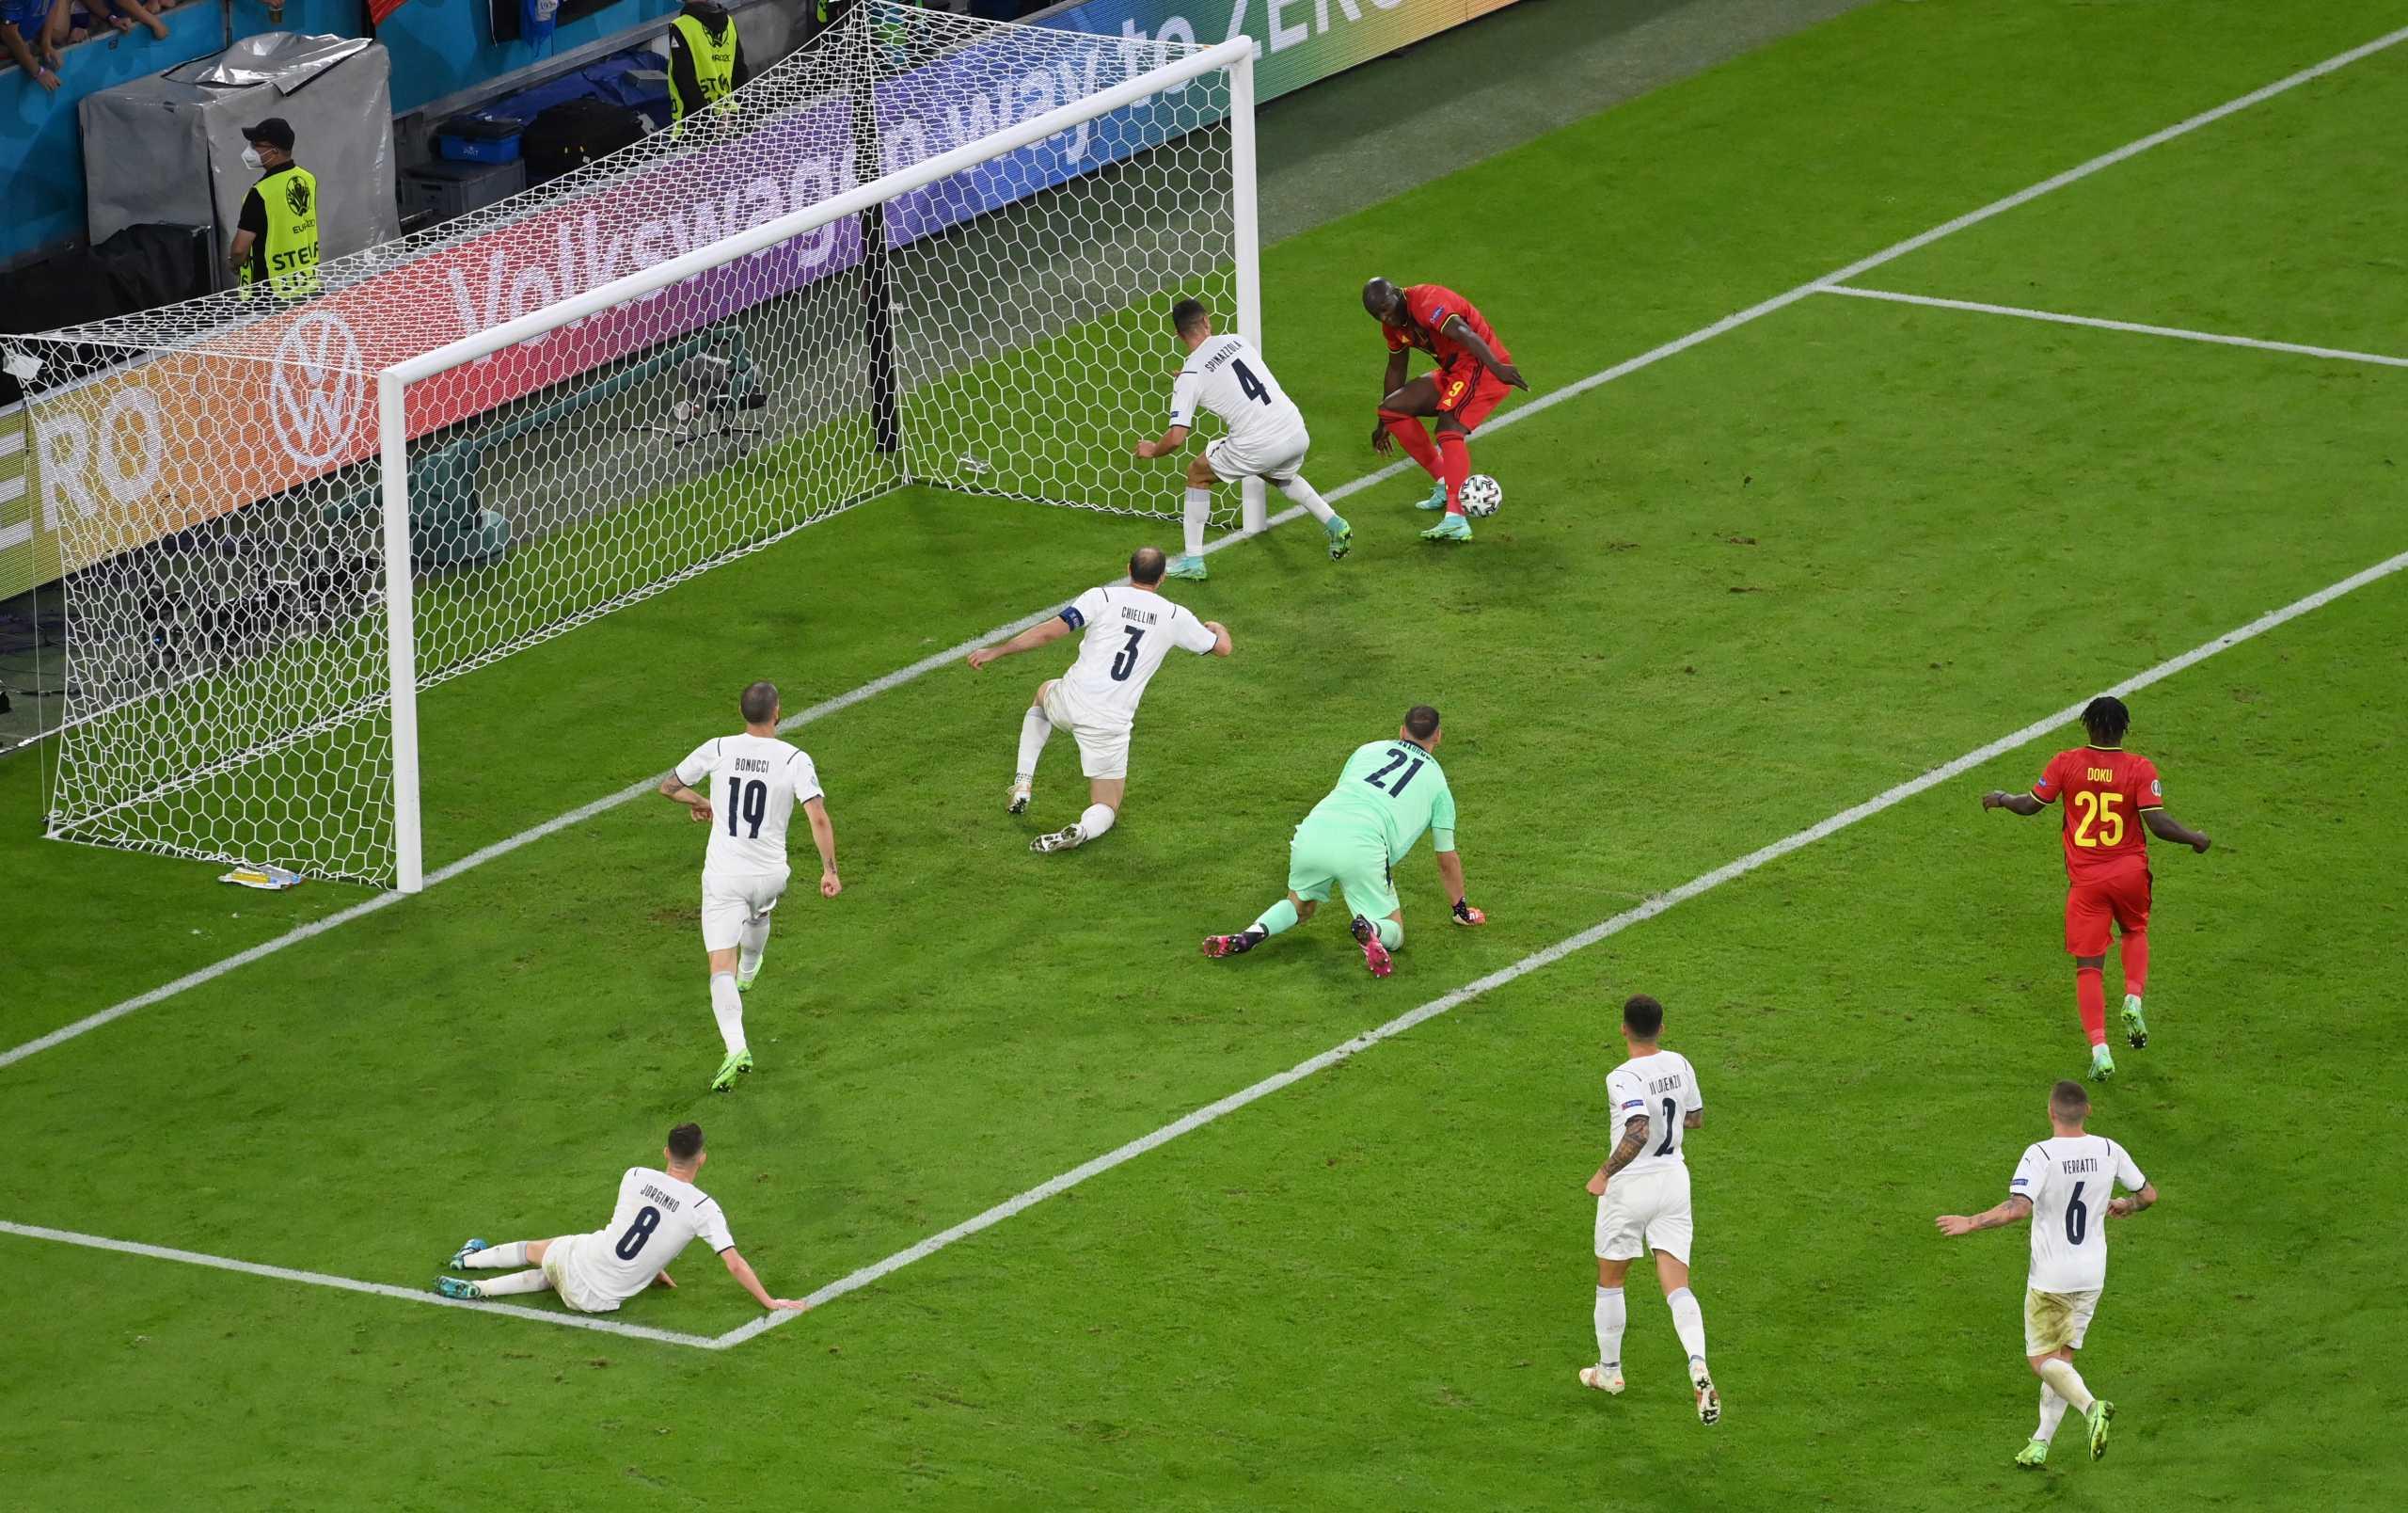 Euro 2020, Βέλγιο – Ιταλία: Η απίστευτη ευκαιρία του Λουκάκου κι ο σωτήρας Σπινατσόλα